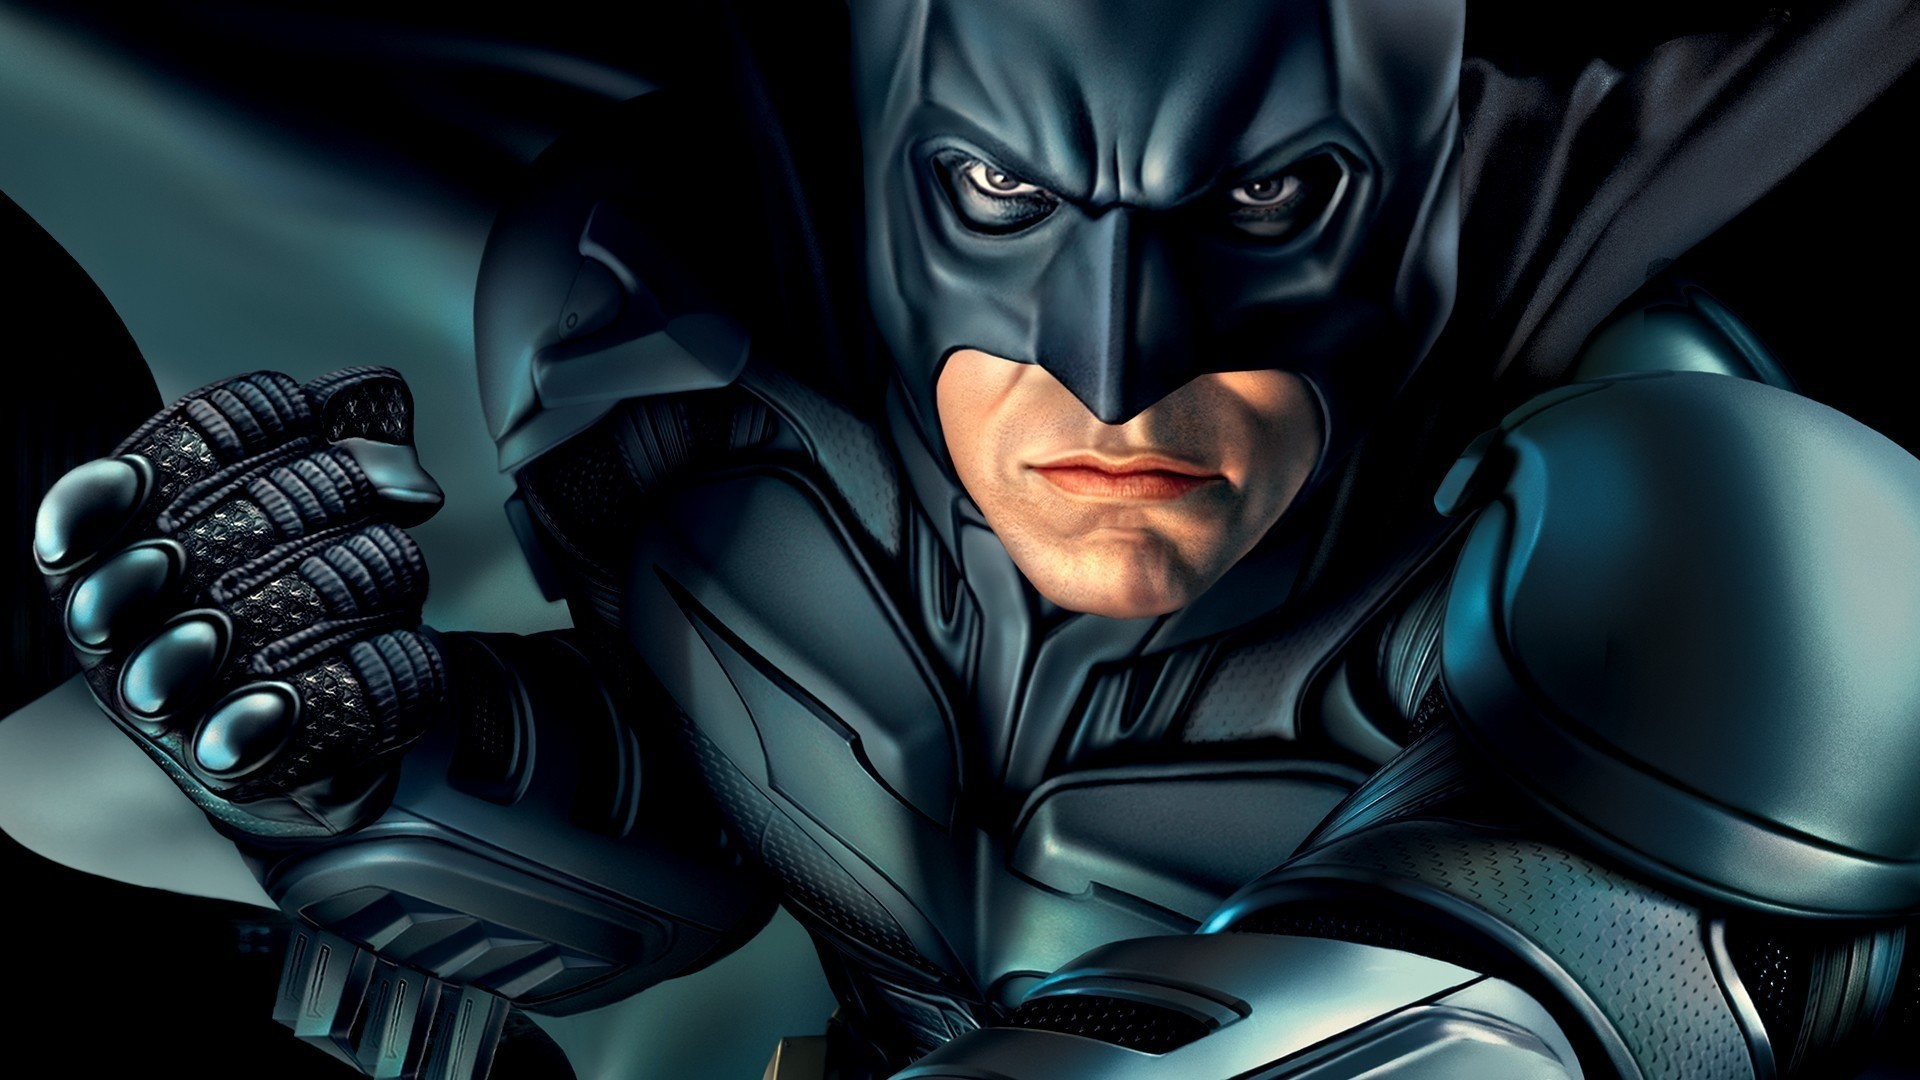 Batman Superman Wallpapers Free